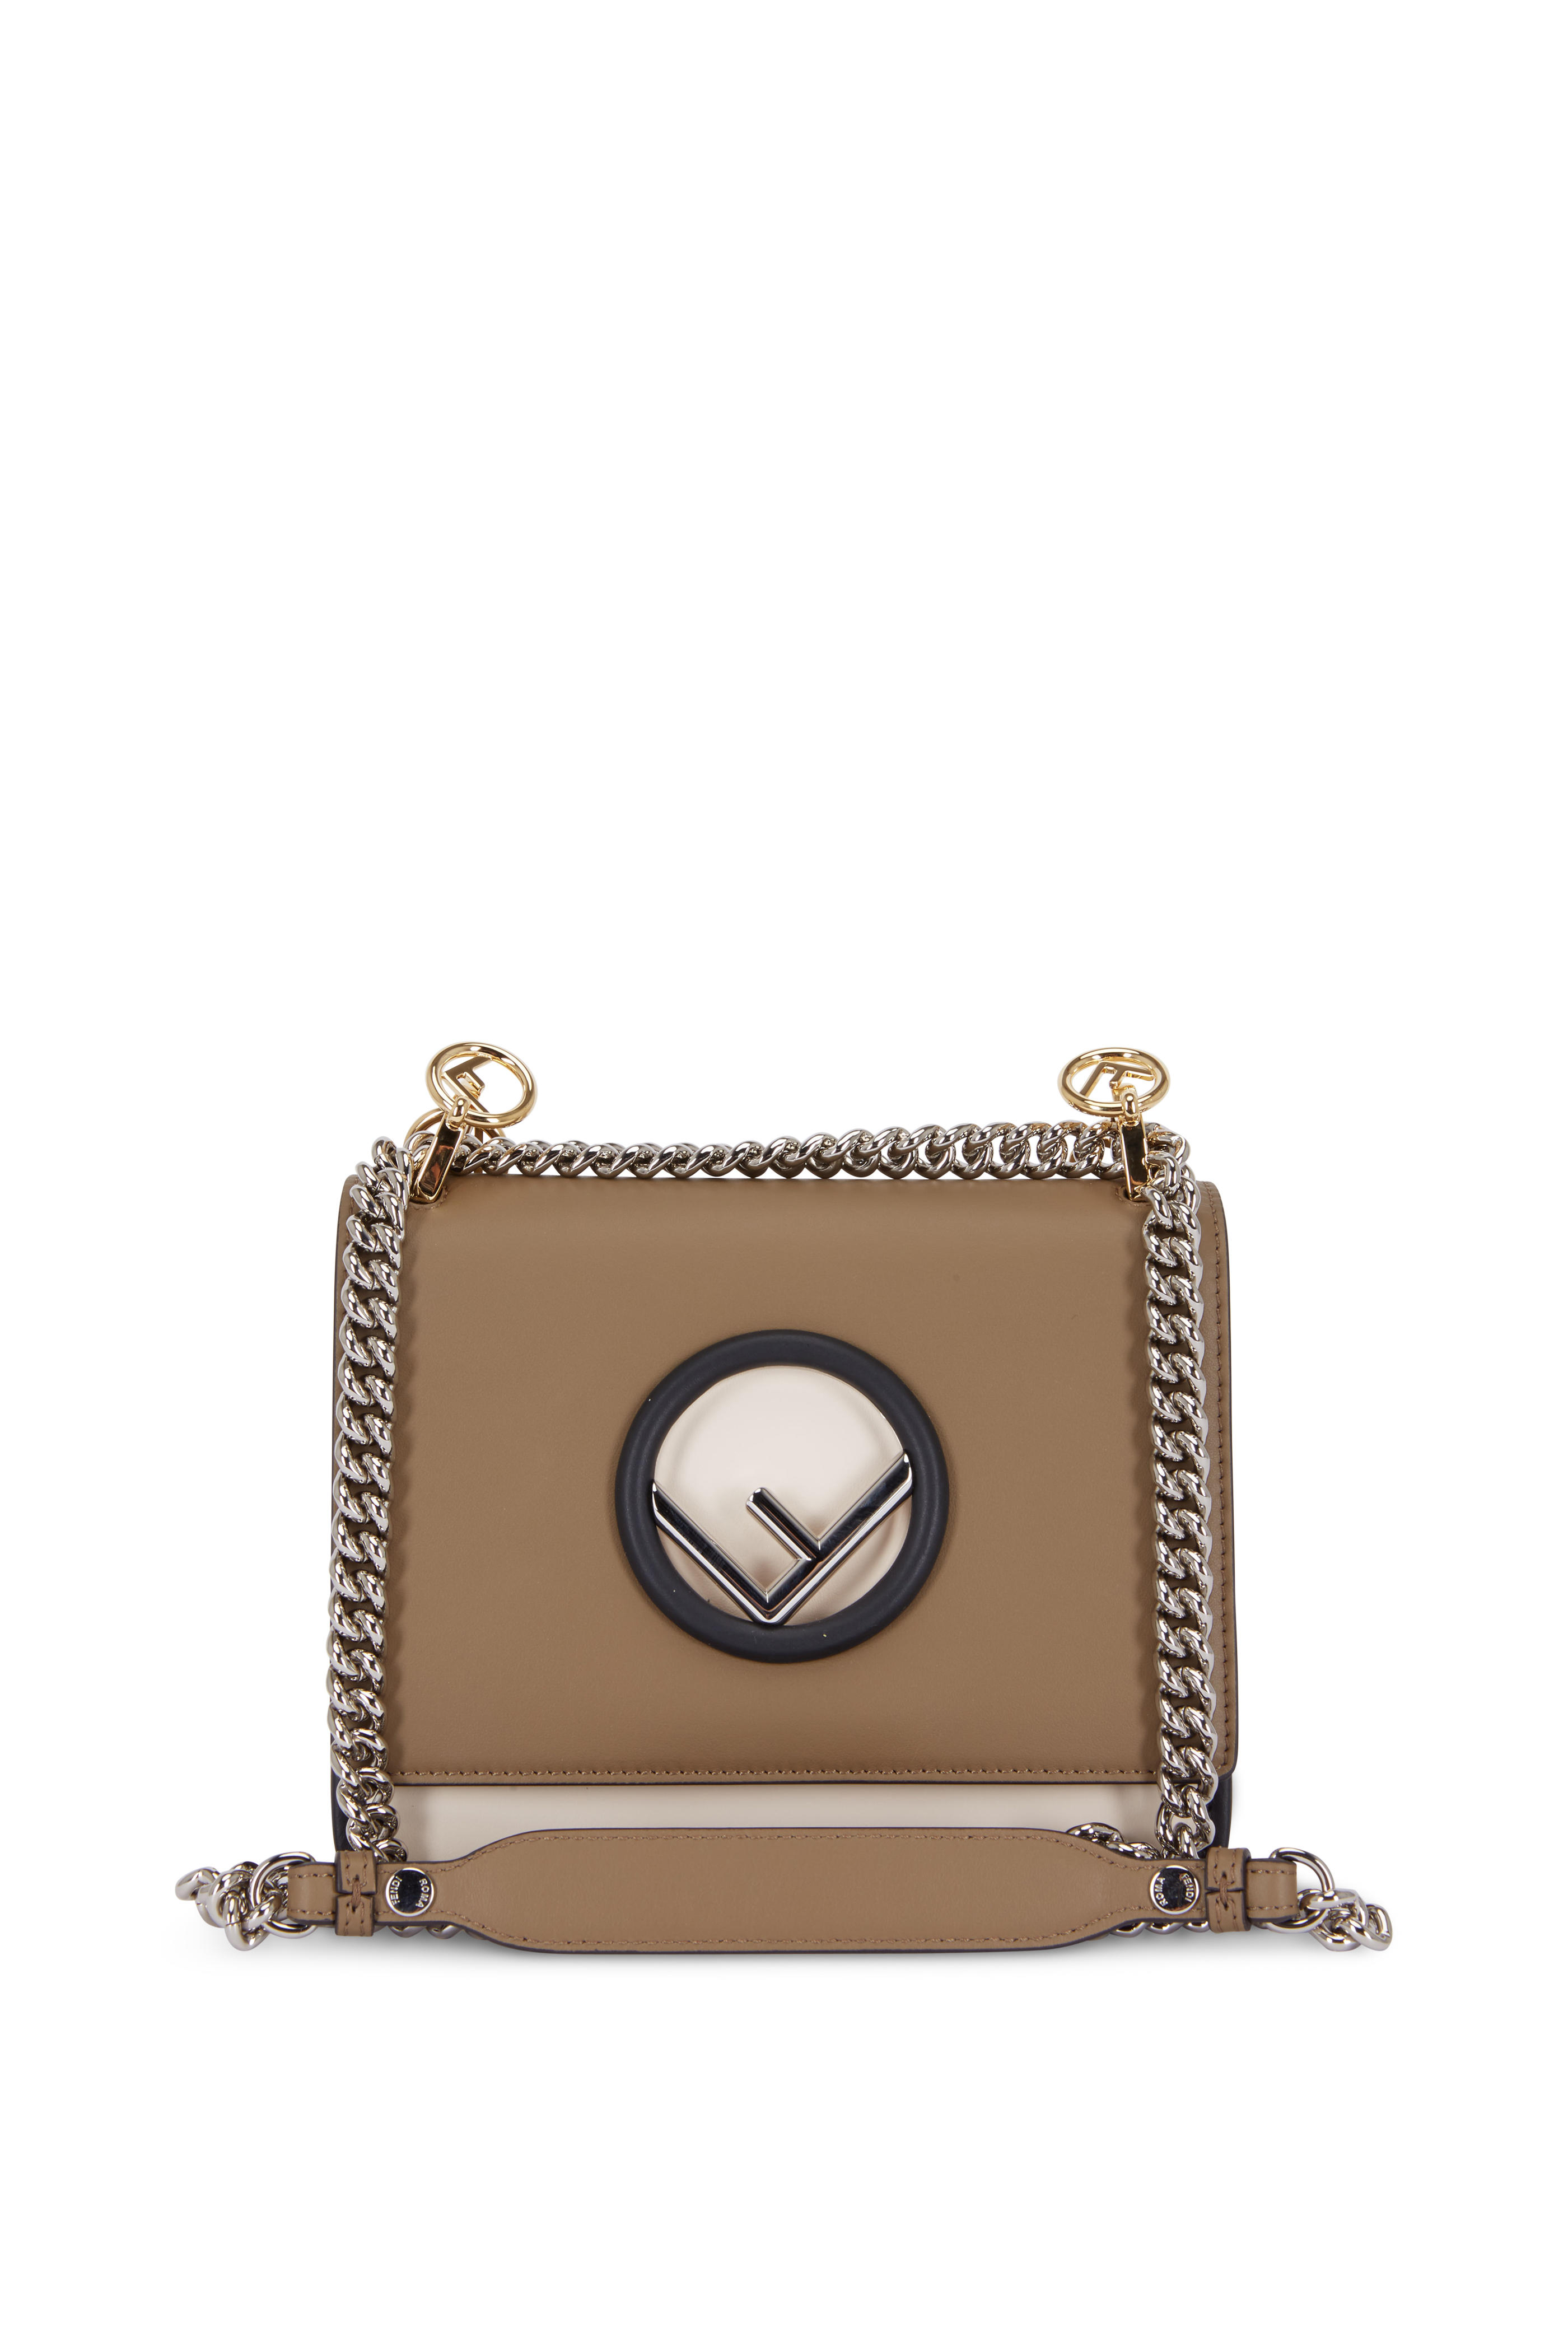 dadcd3db947b Fendi - Kan I Dark Taupe Leather Small Shoulder Bag